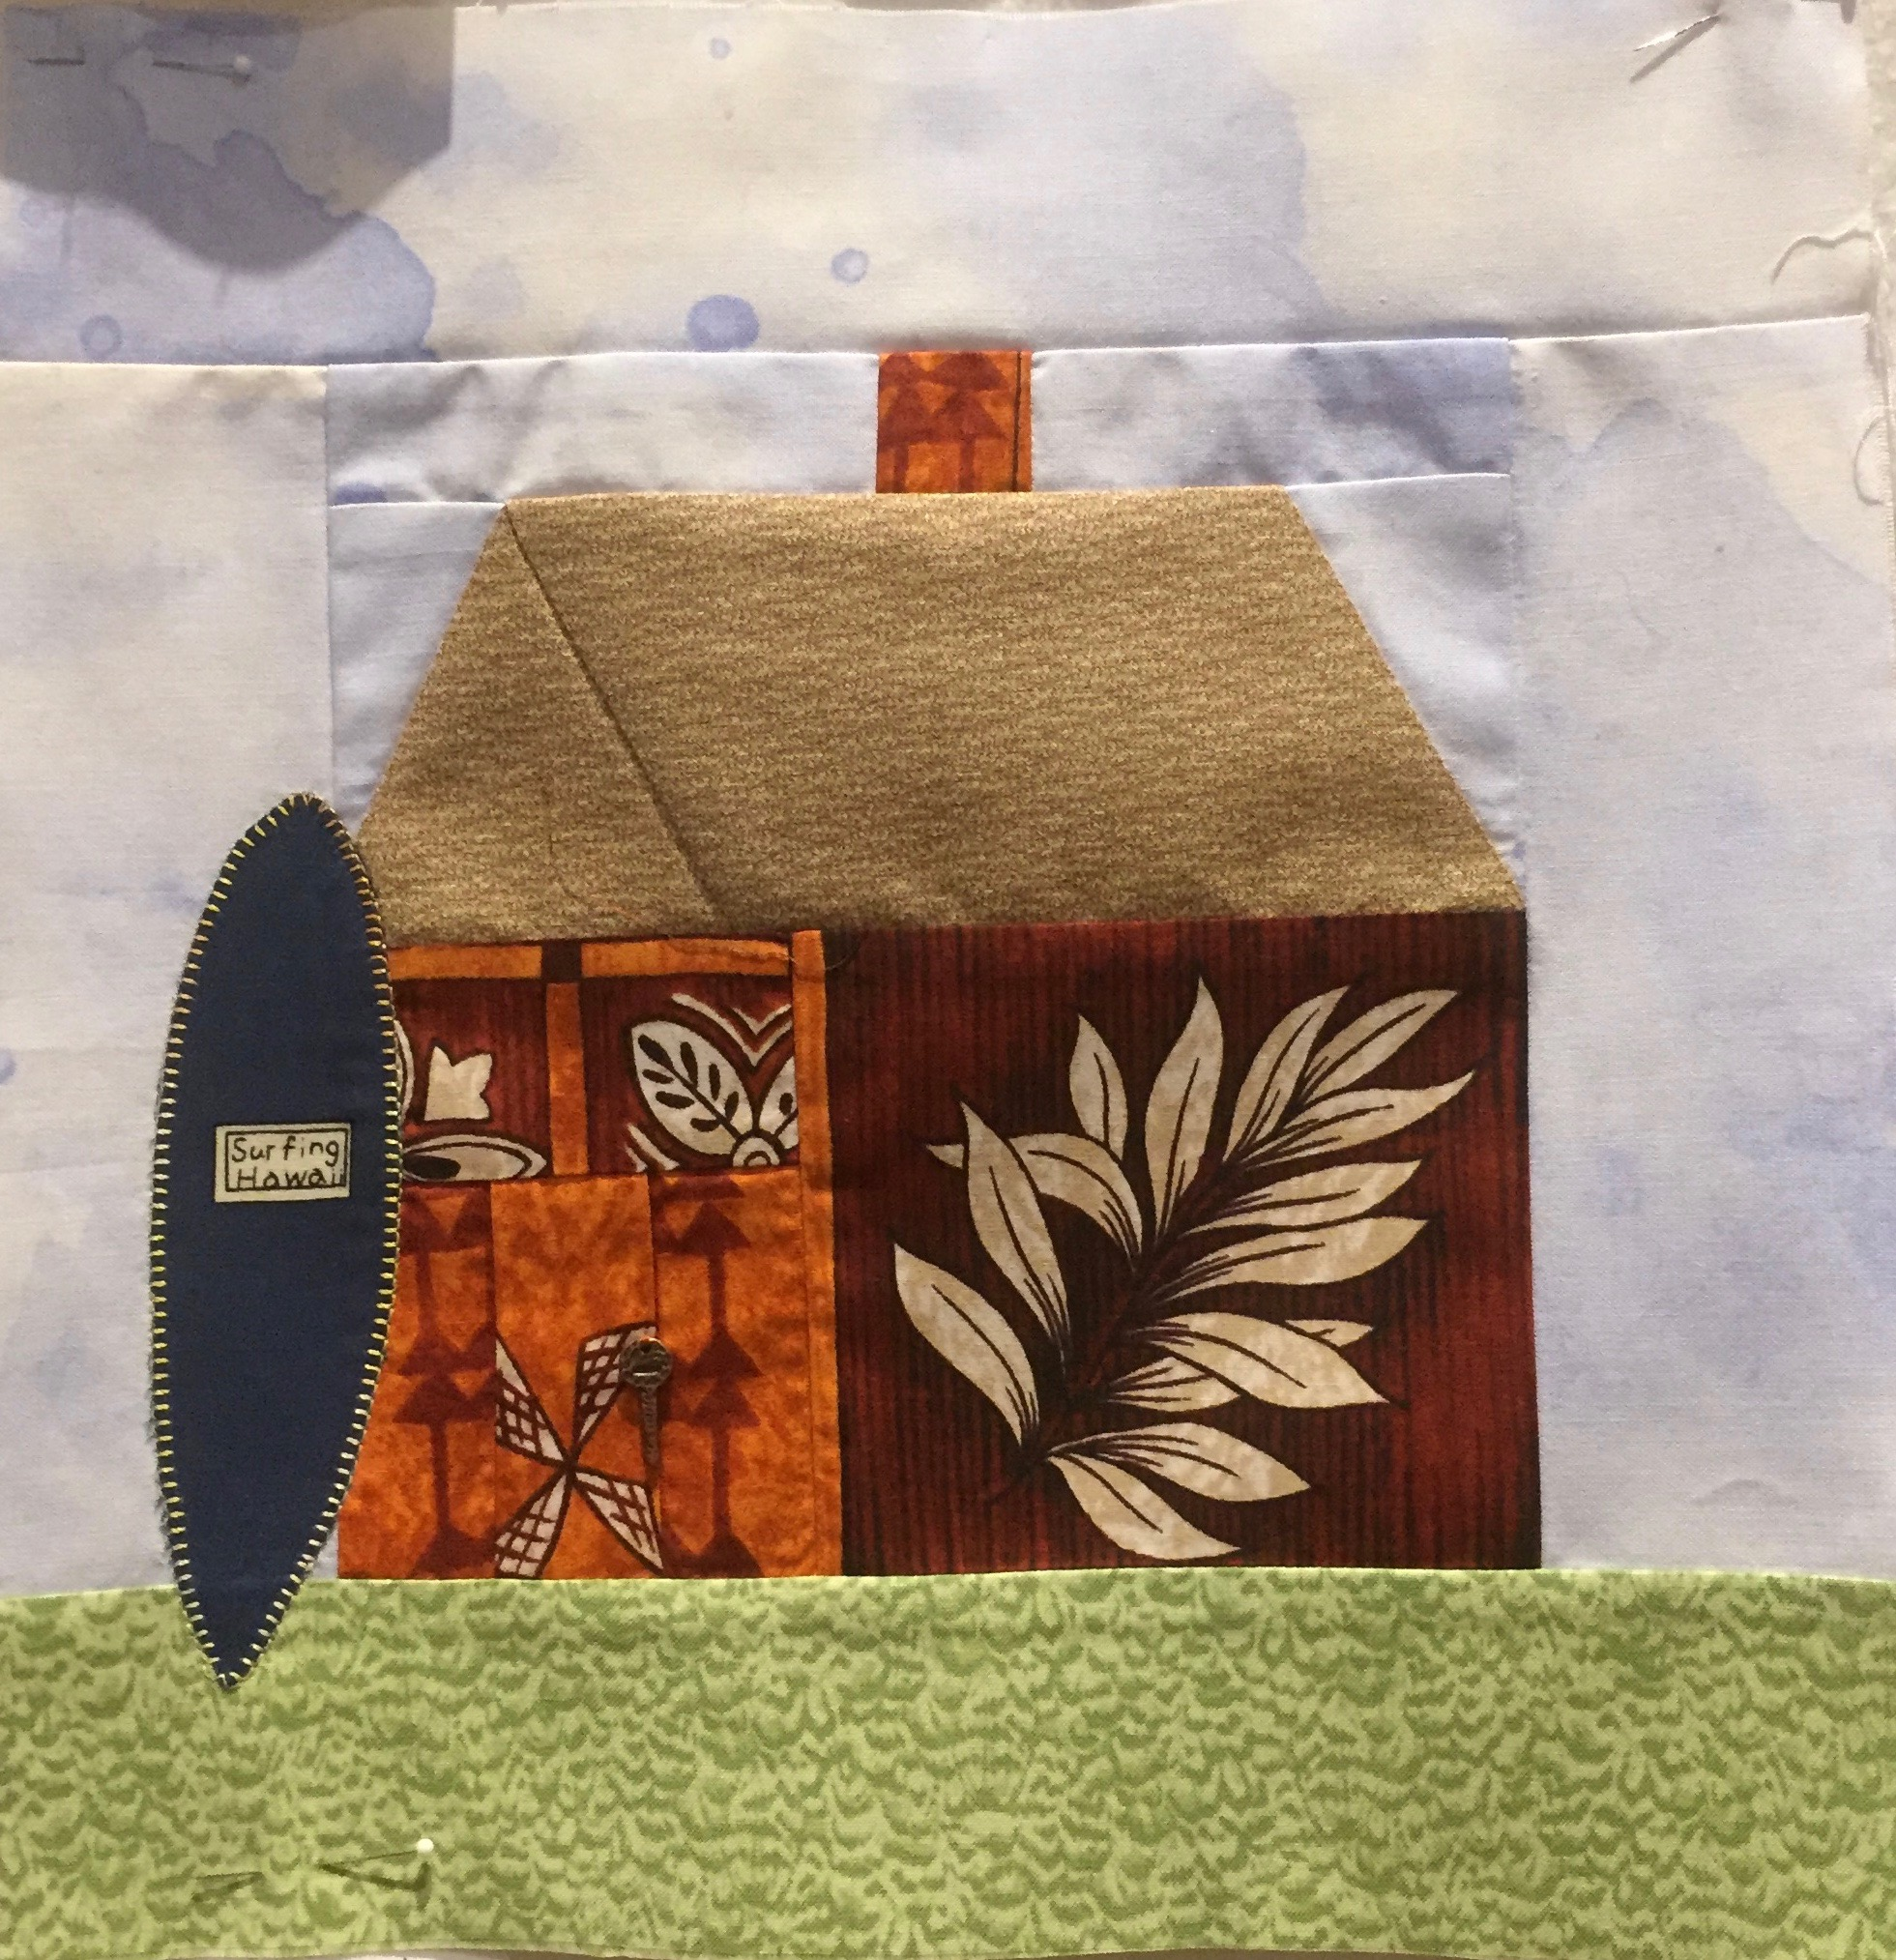 Summer House Mary Jamora.jpg